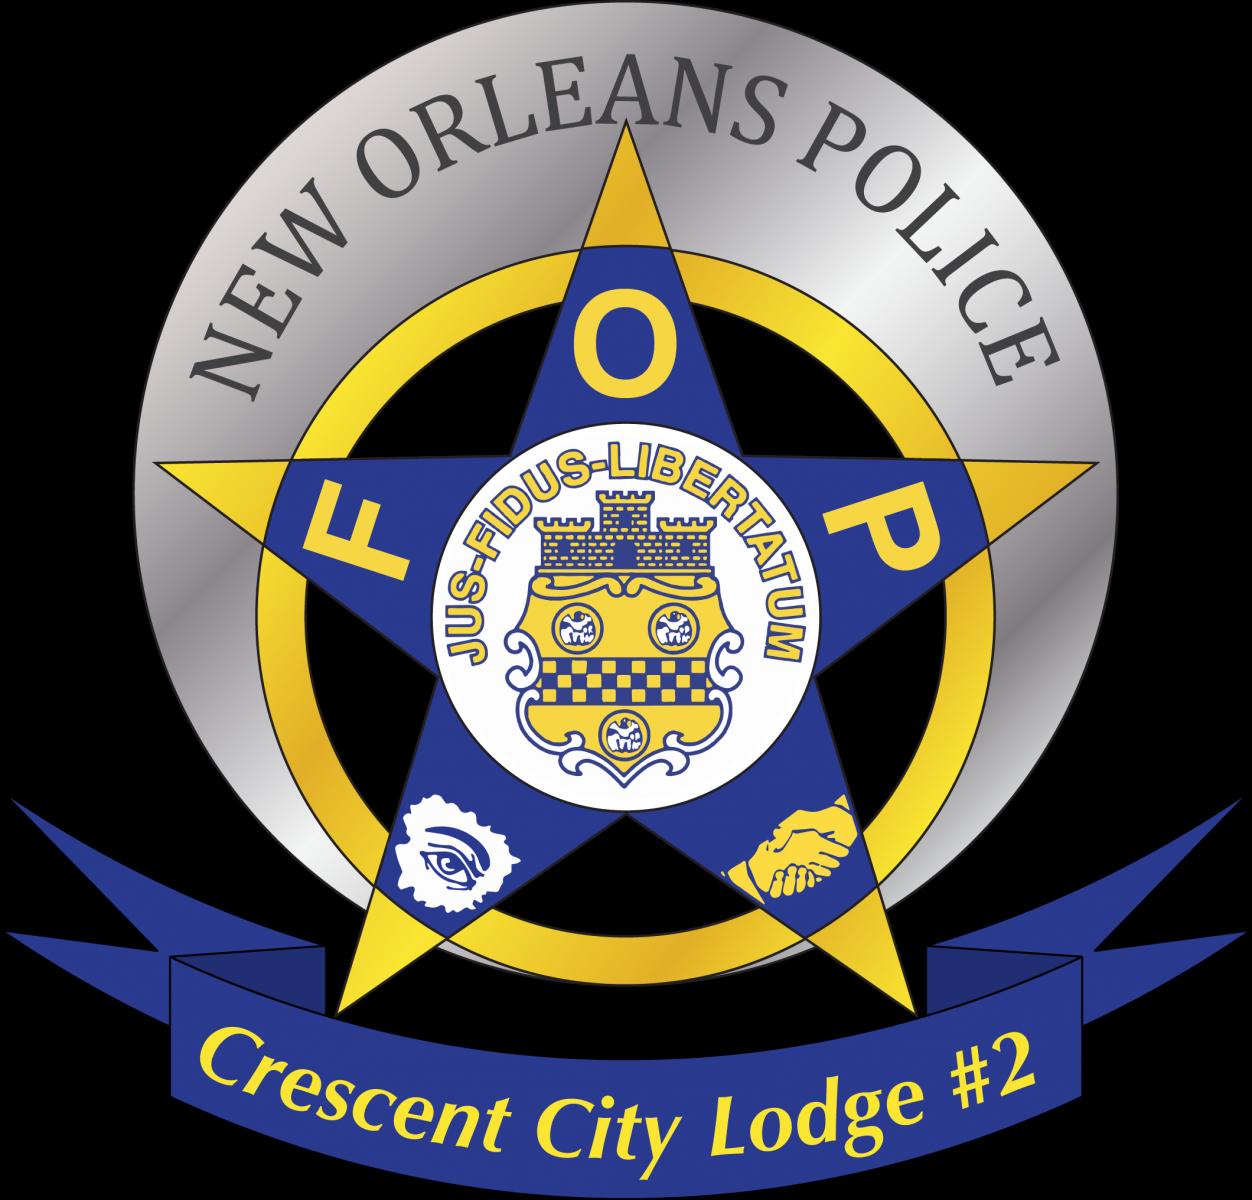 September 2015 minutes fraternal order of police september 2015 minutes buycottarizona Choice Image